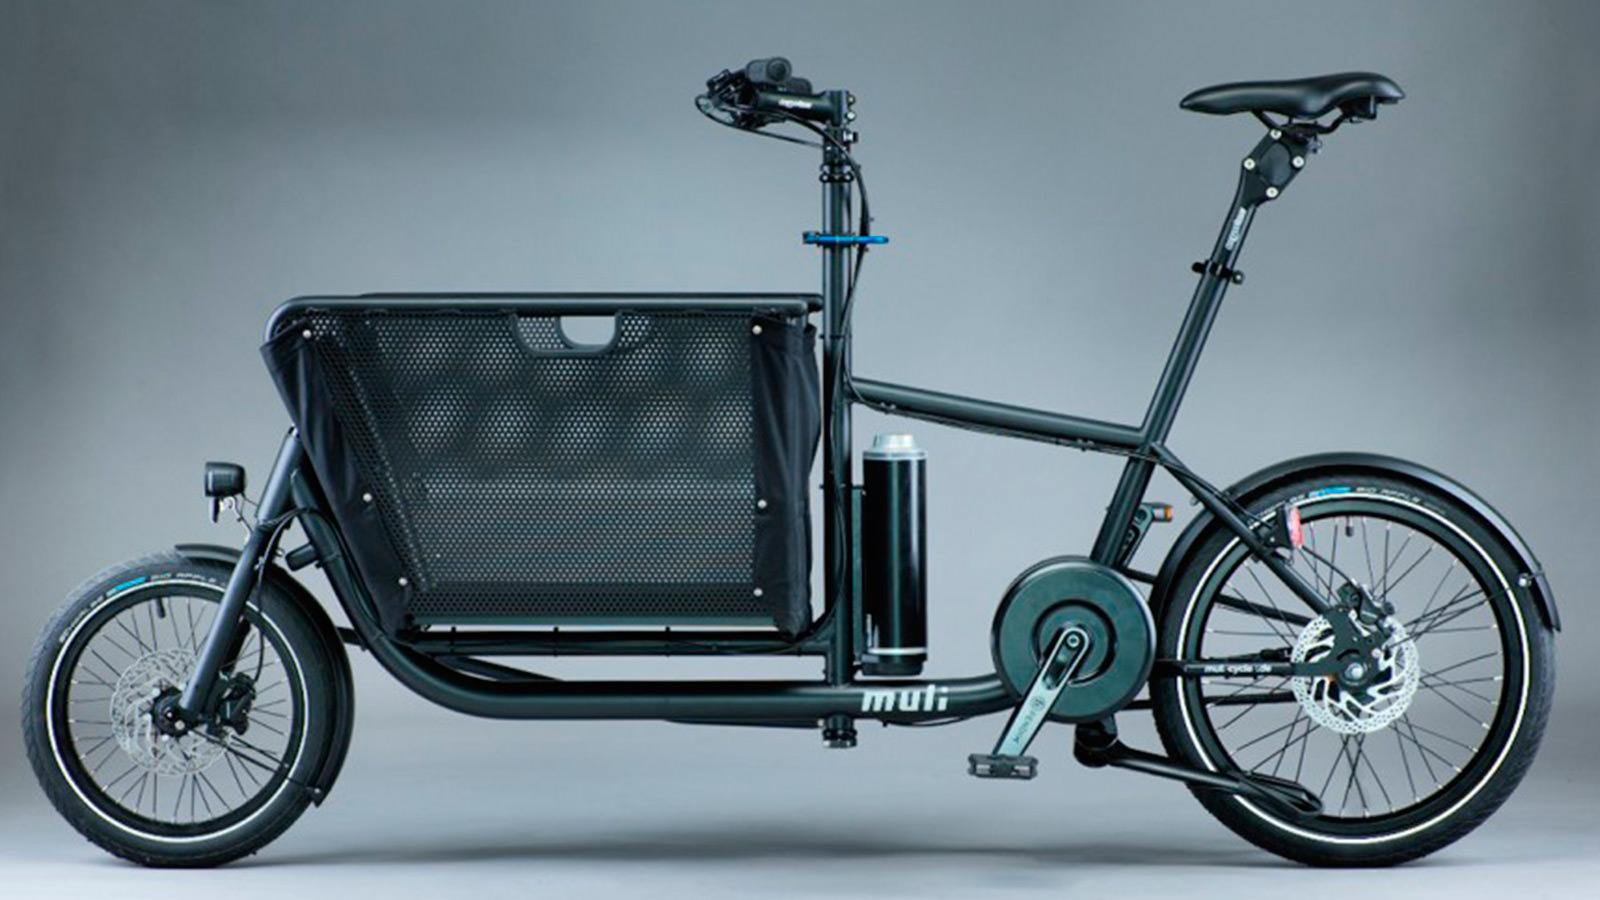 e muli foldable cargo bike imboldn. Black Bedroom Furniture Sets. Home Design Ideas